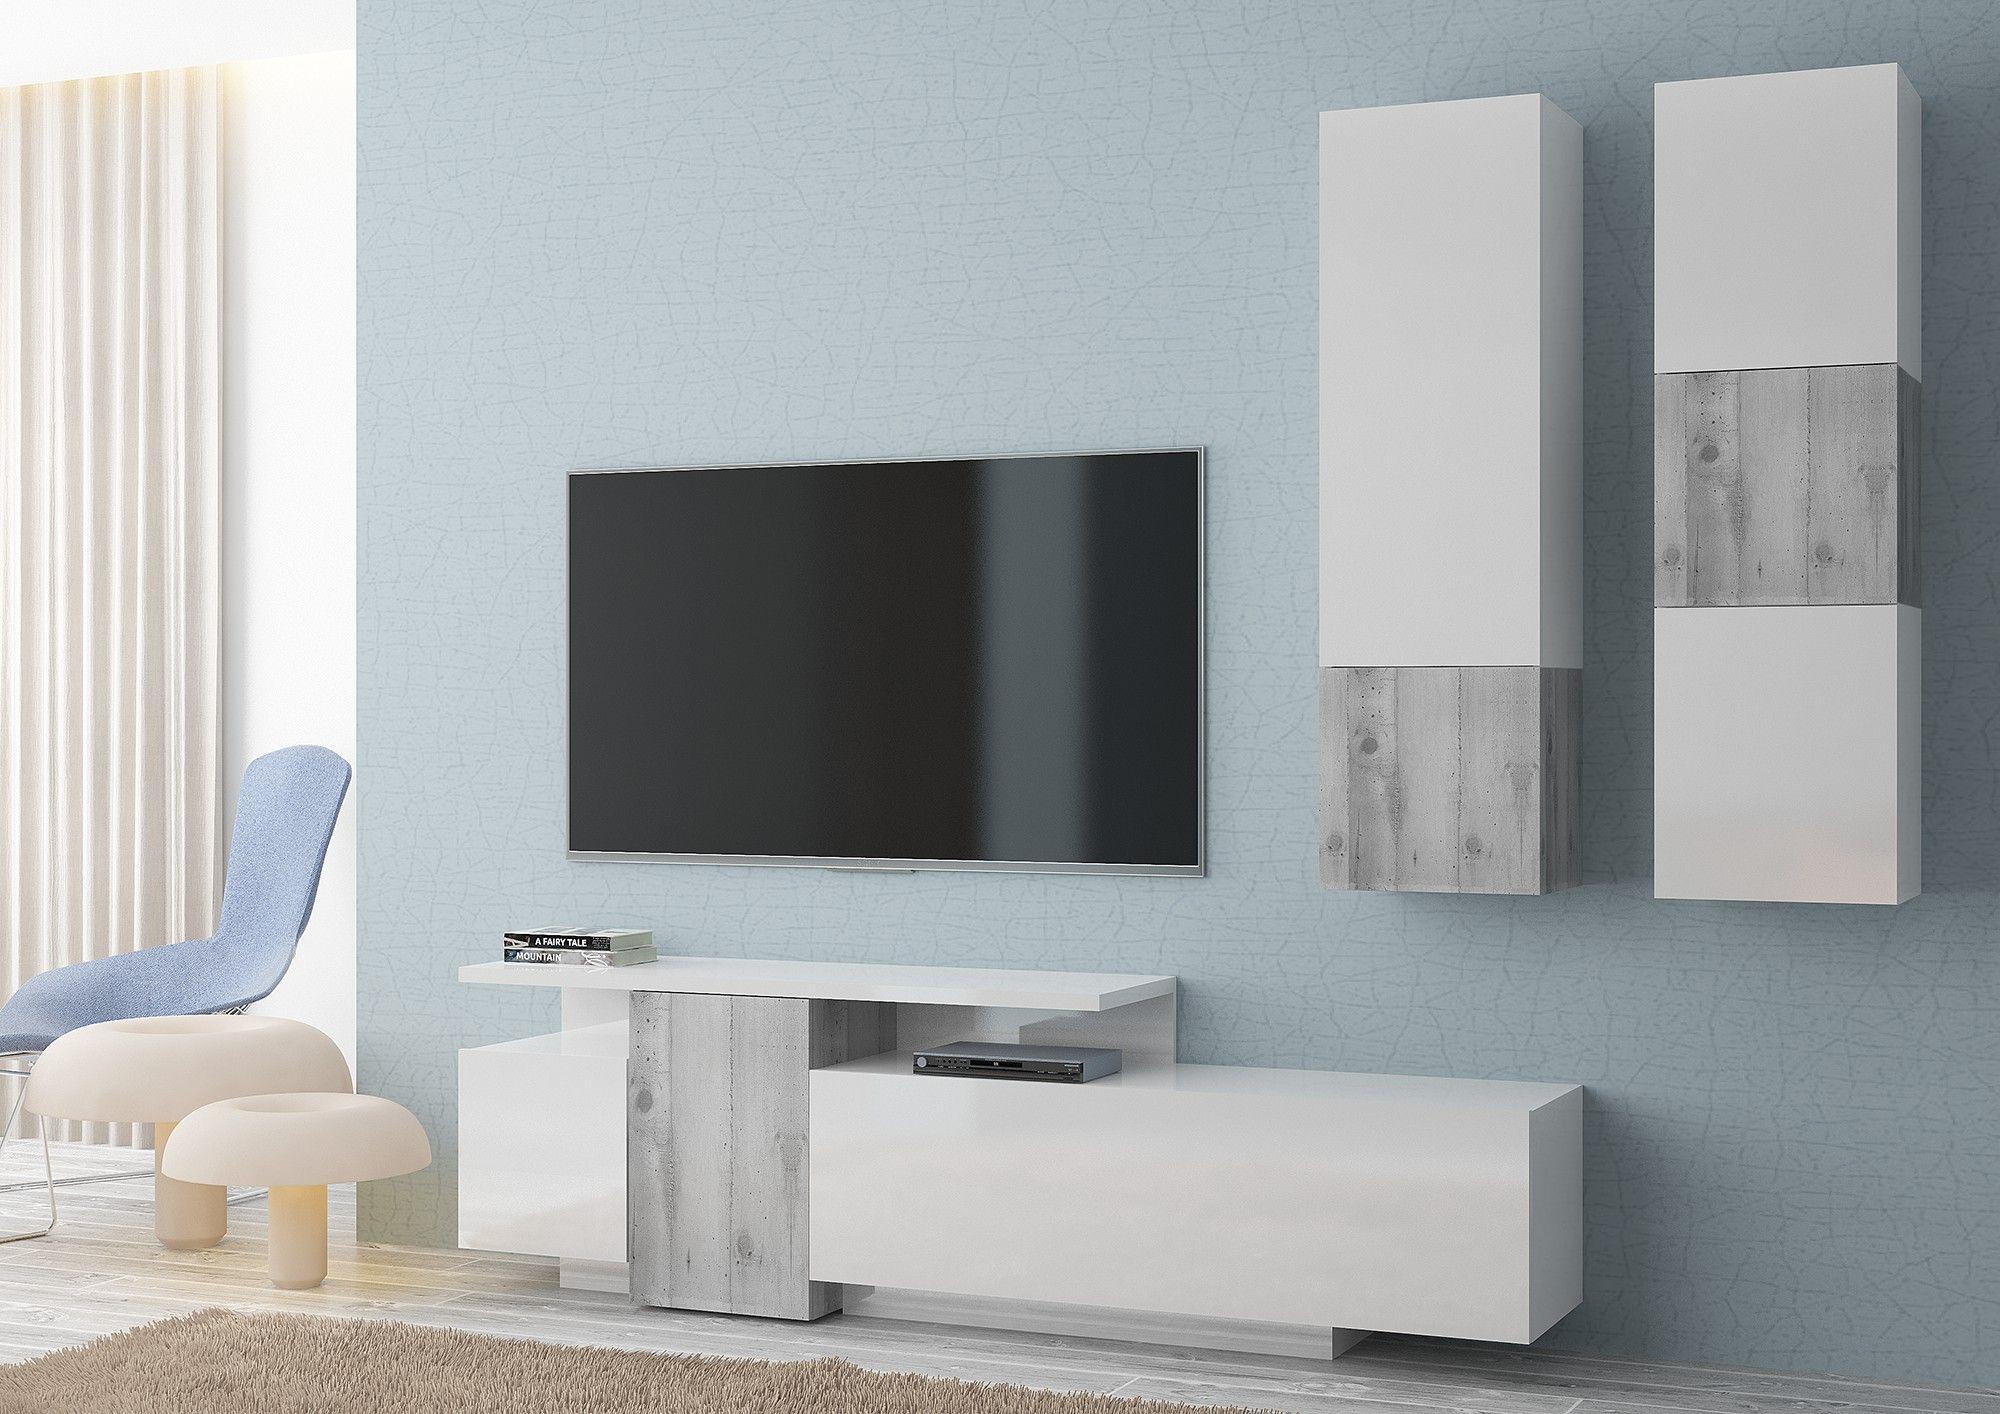 Epingle Par Manman Cheung Sur Living Room Meuble Tv Mural Design